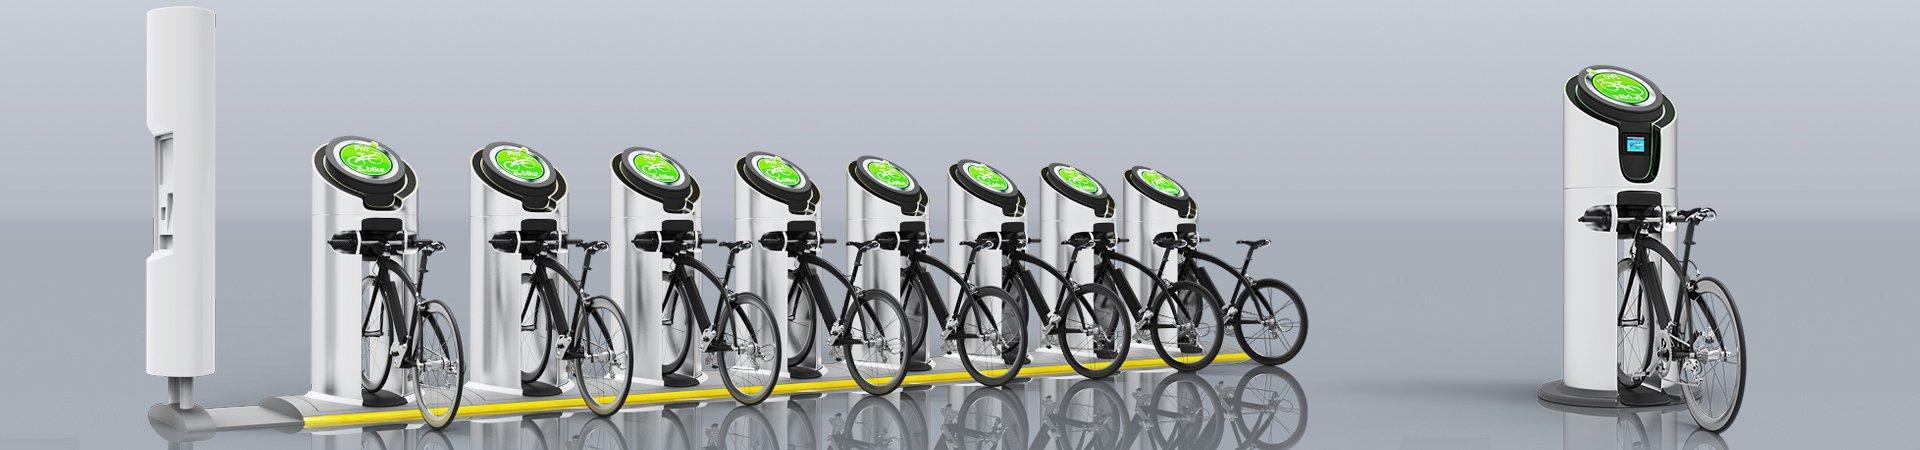 Bike Charging Station Product Design by Kohlex